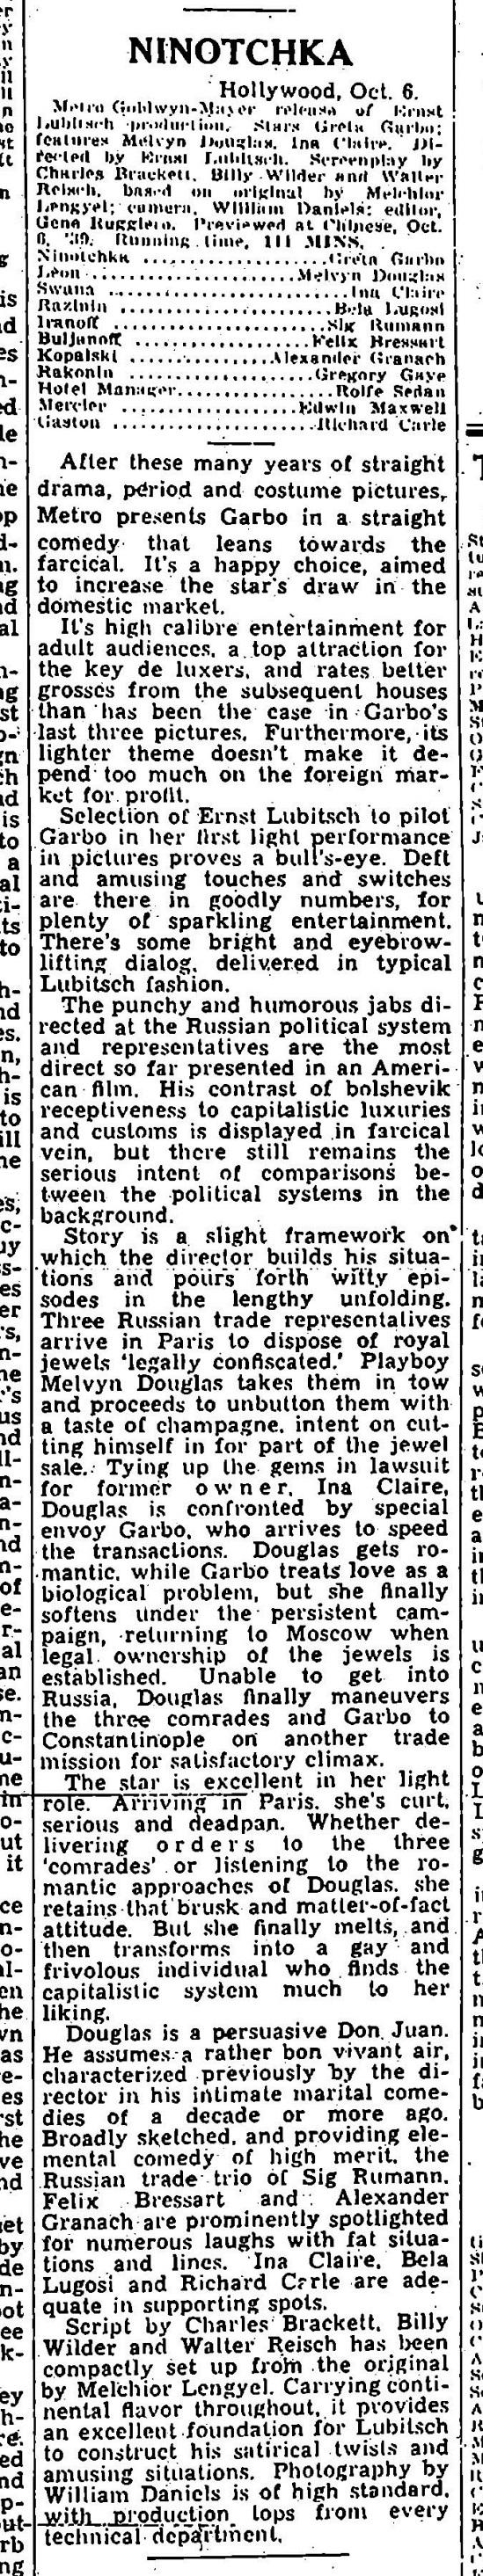 Ninotchka, Variety, October 6, 1939